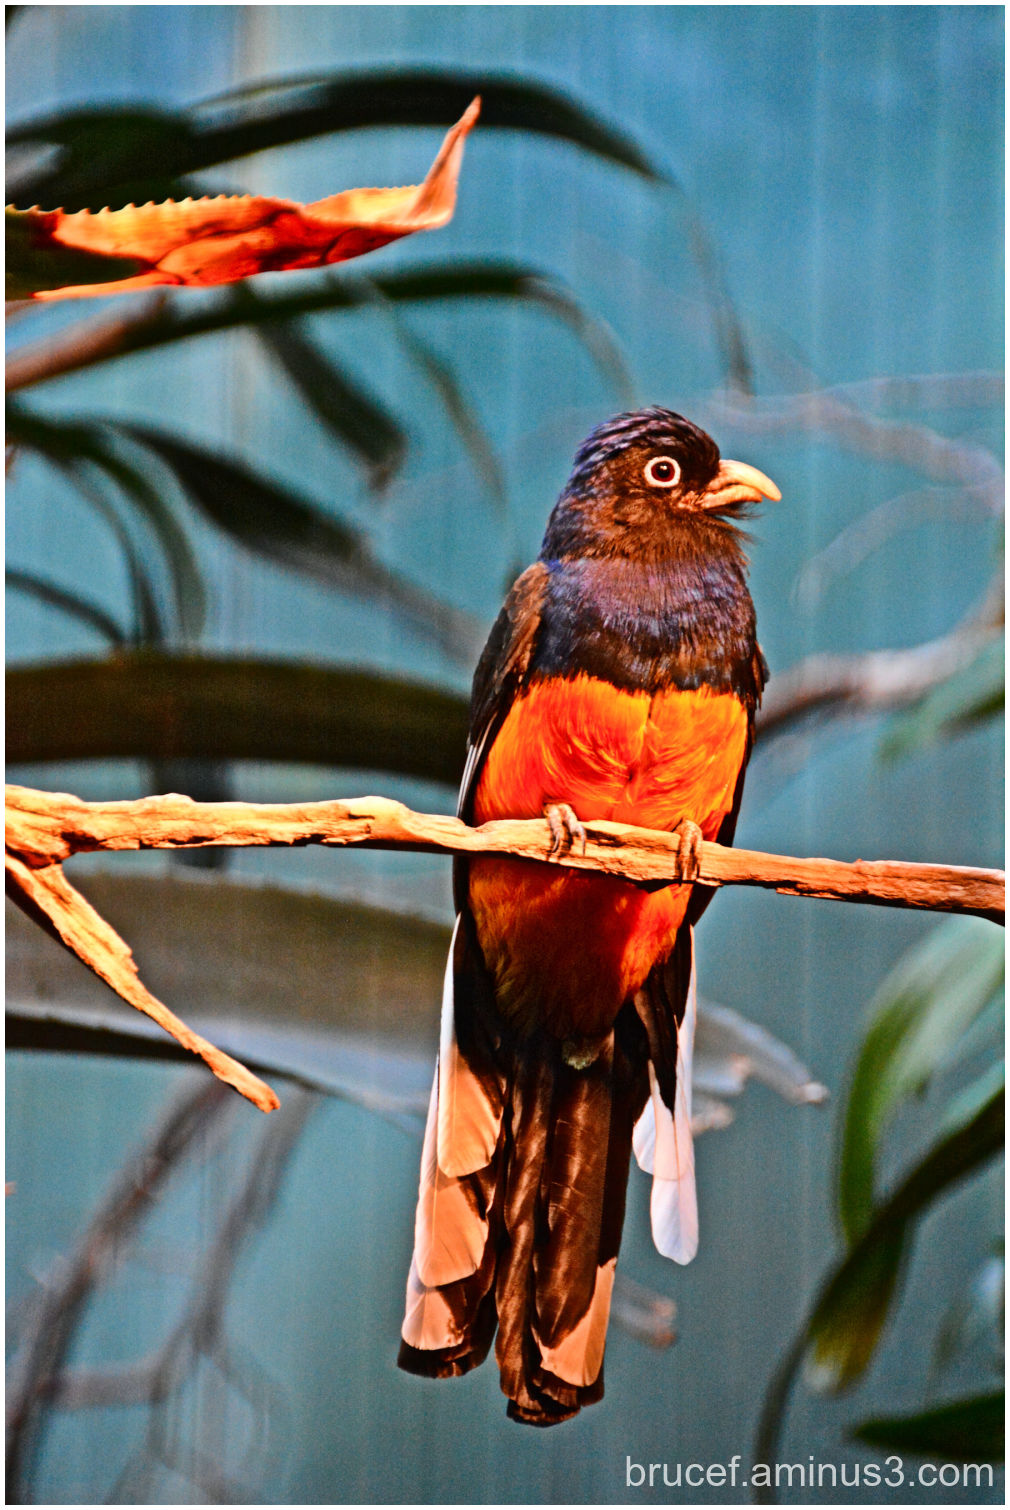 Green-backed Trogon Woodfield Zoo